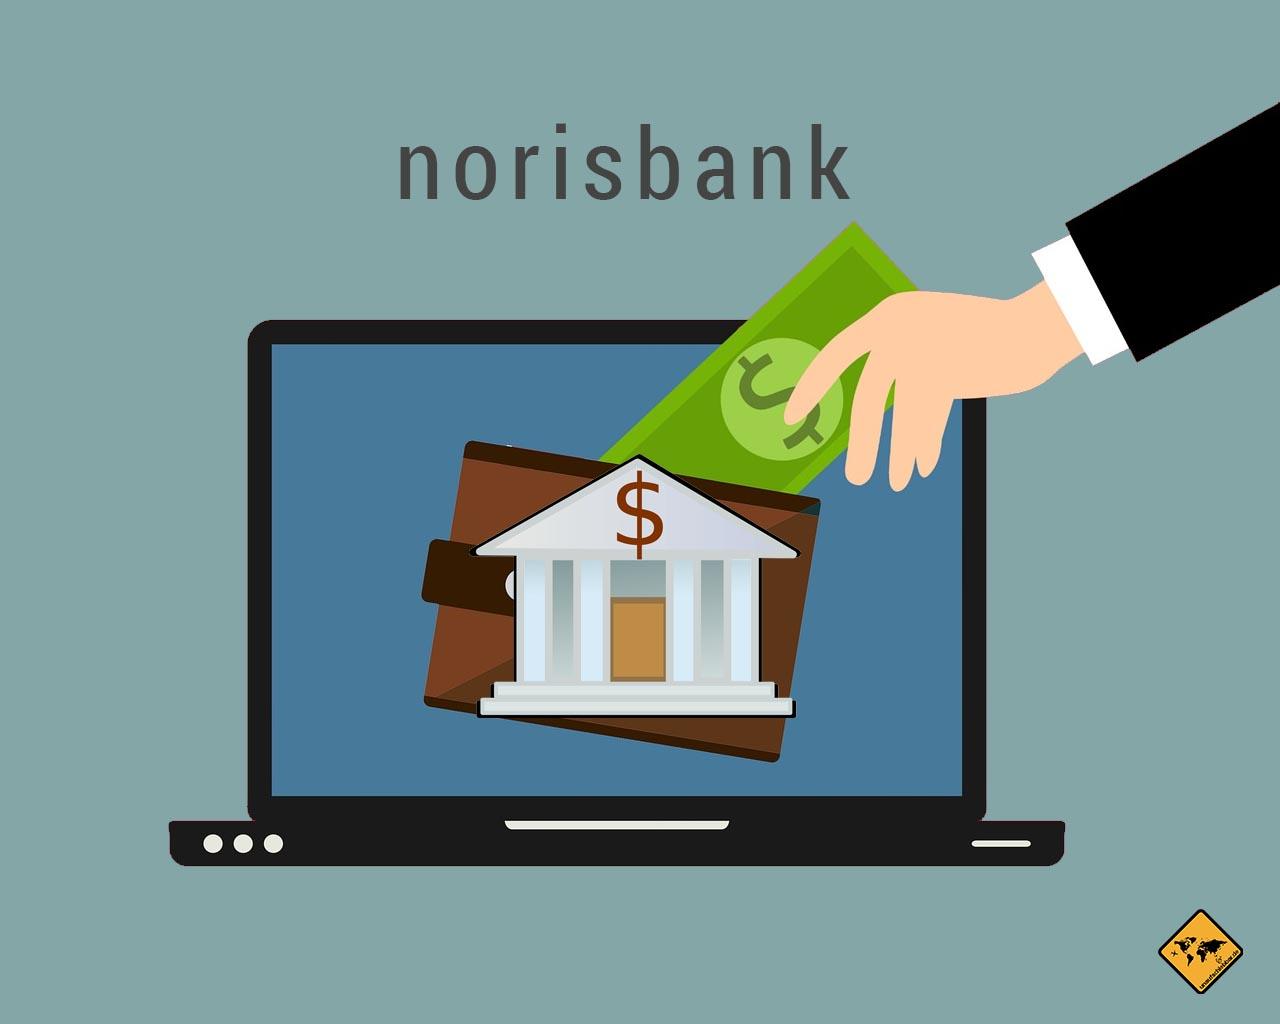 norisbank Girokonto Kreditkarte